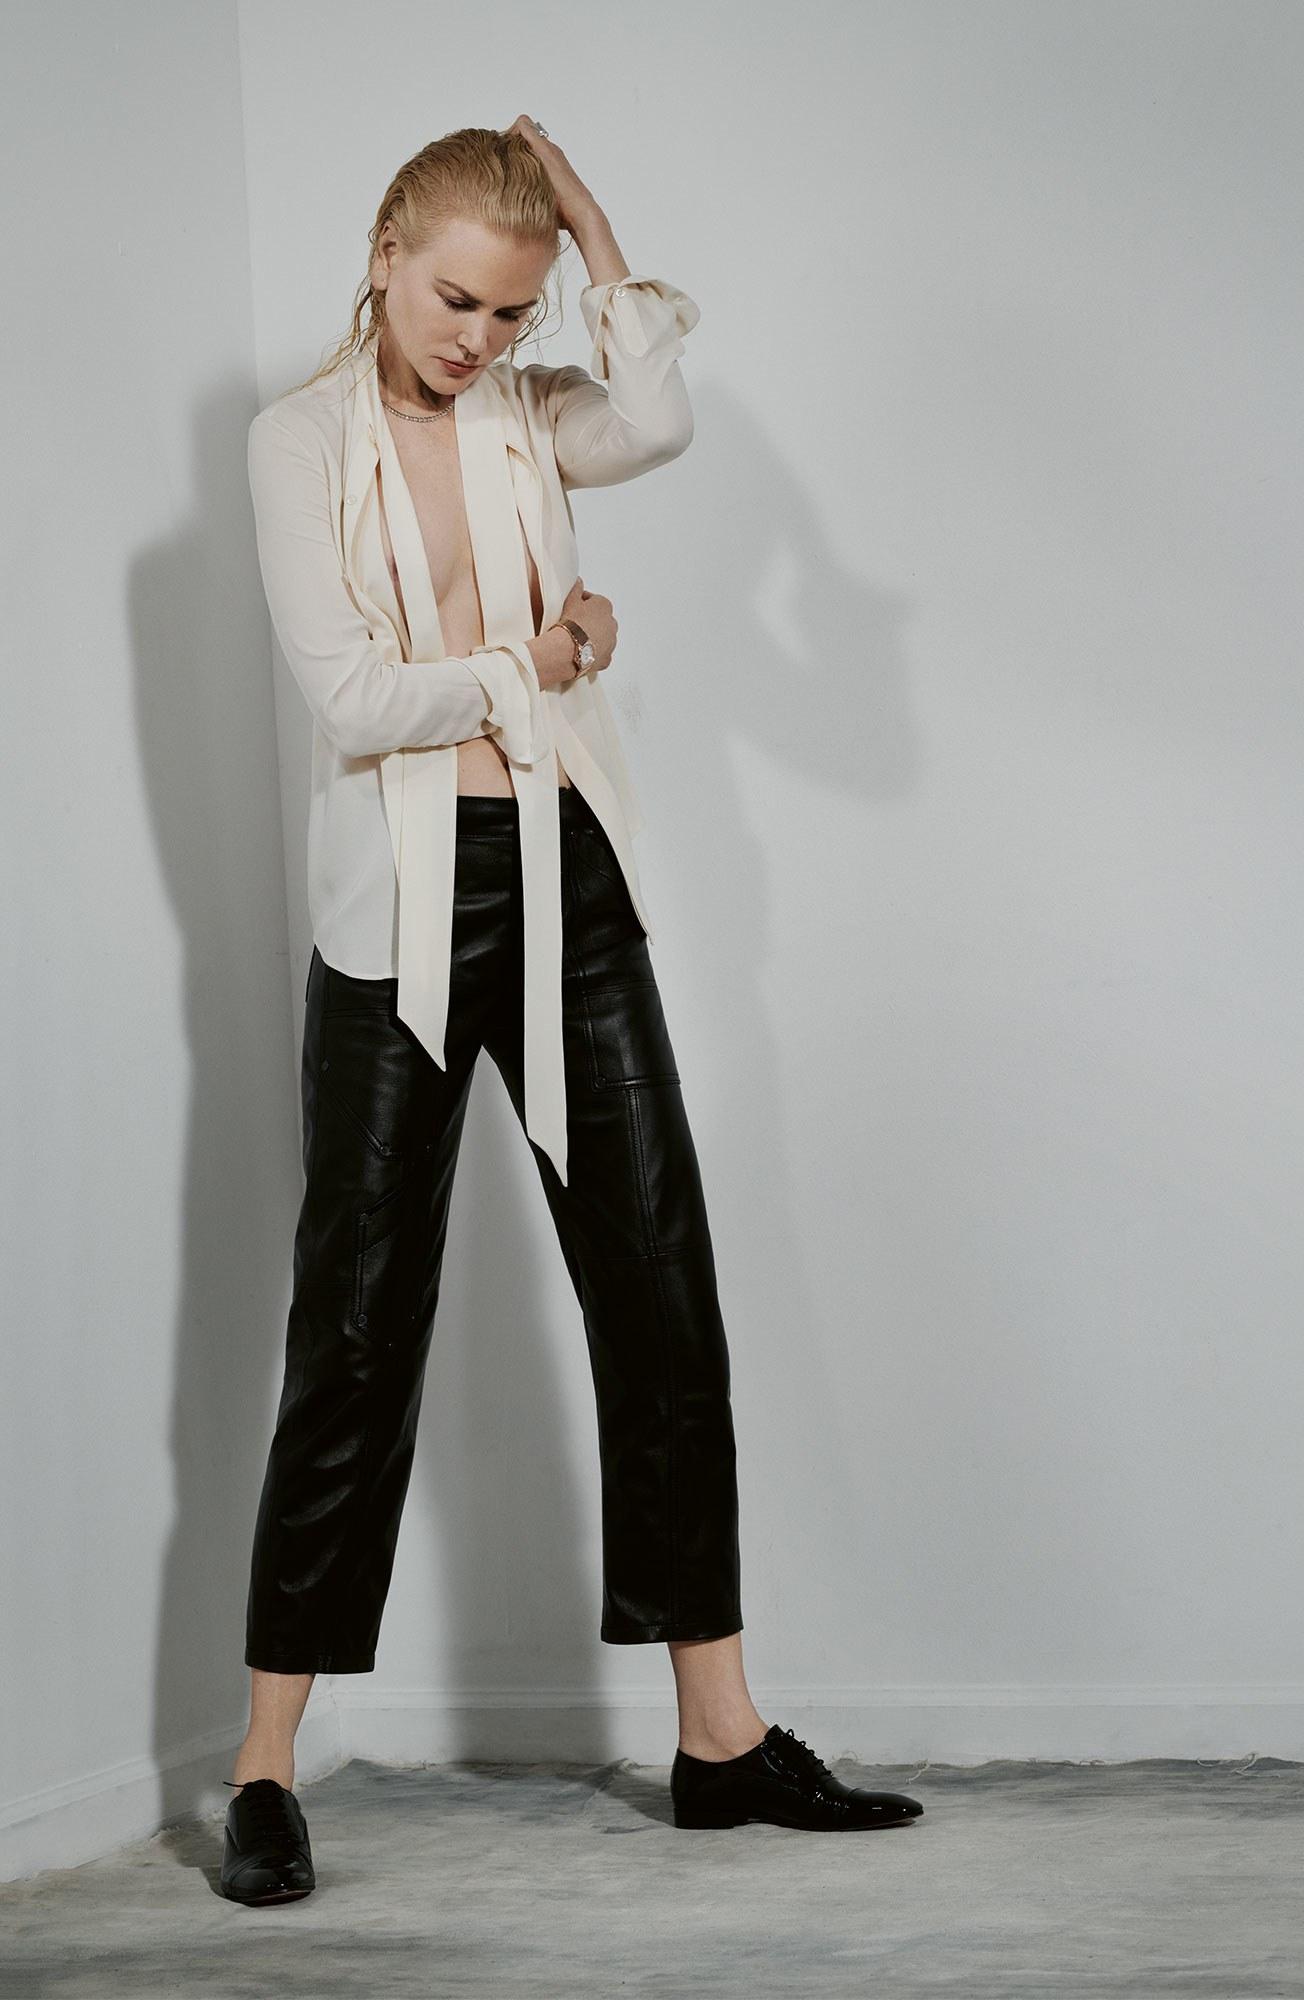 Nicole Kidman by Collier Schorr for Vanity Fair US May 2019 (9).jpg